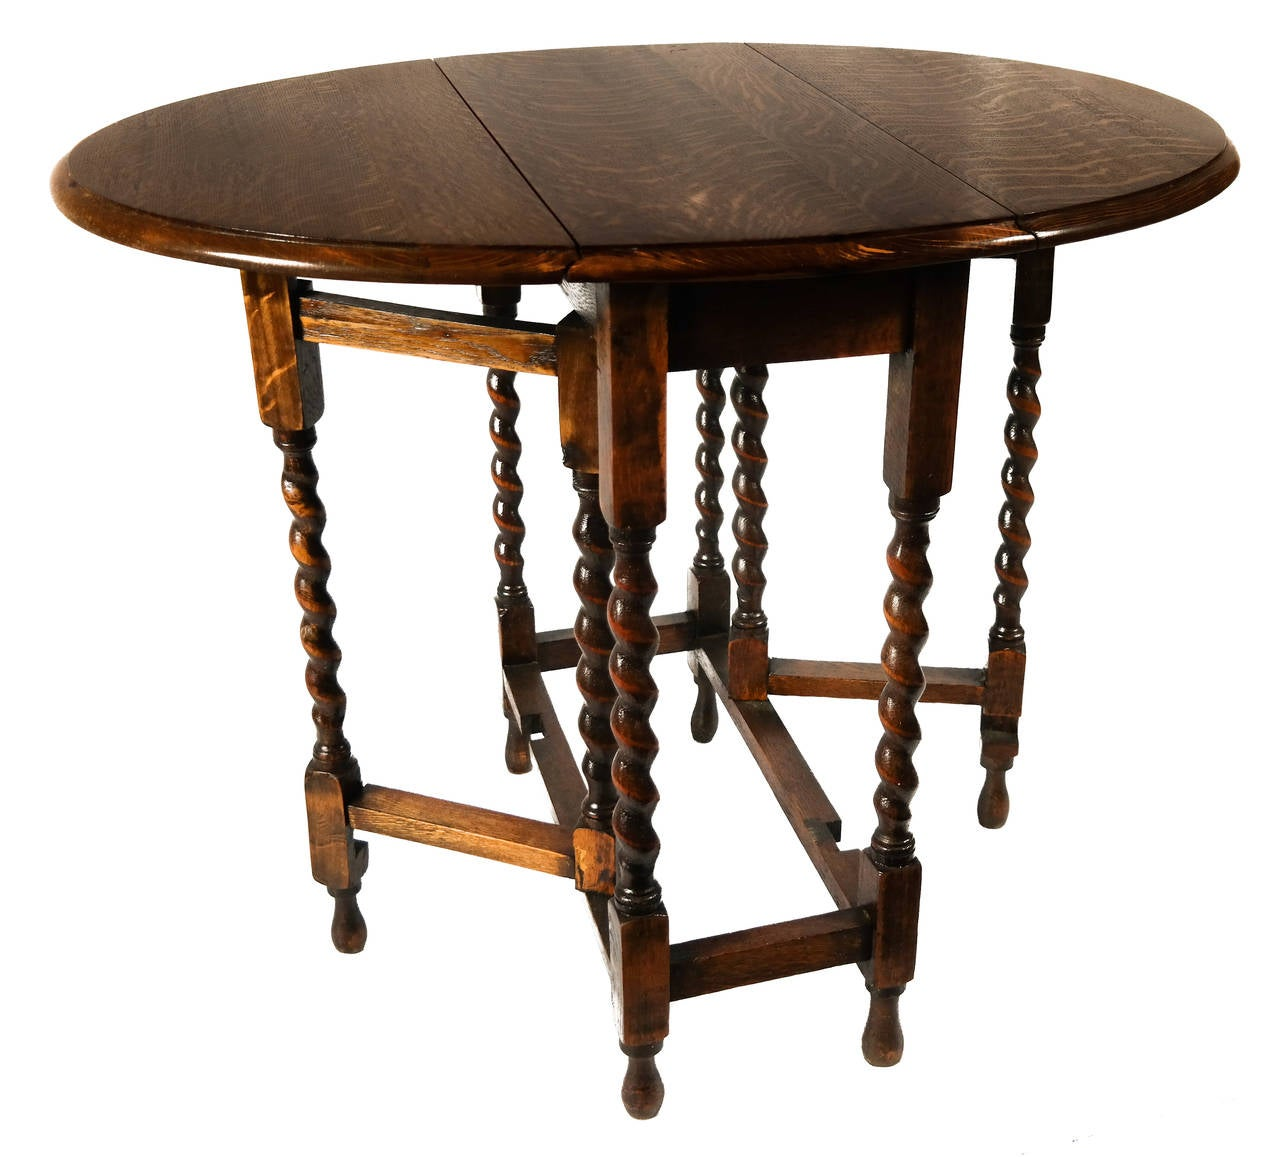 Gateleg table at 1stdibs - Gateleg table with chairs ...